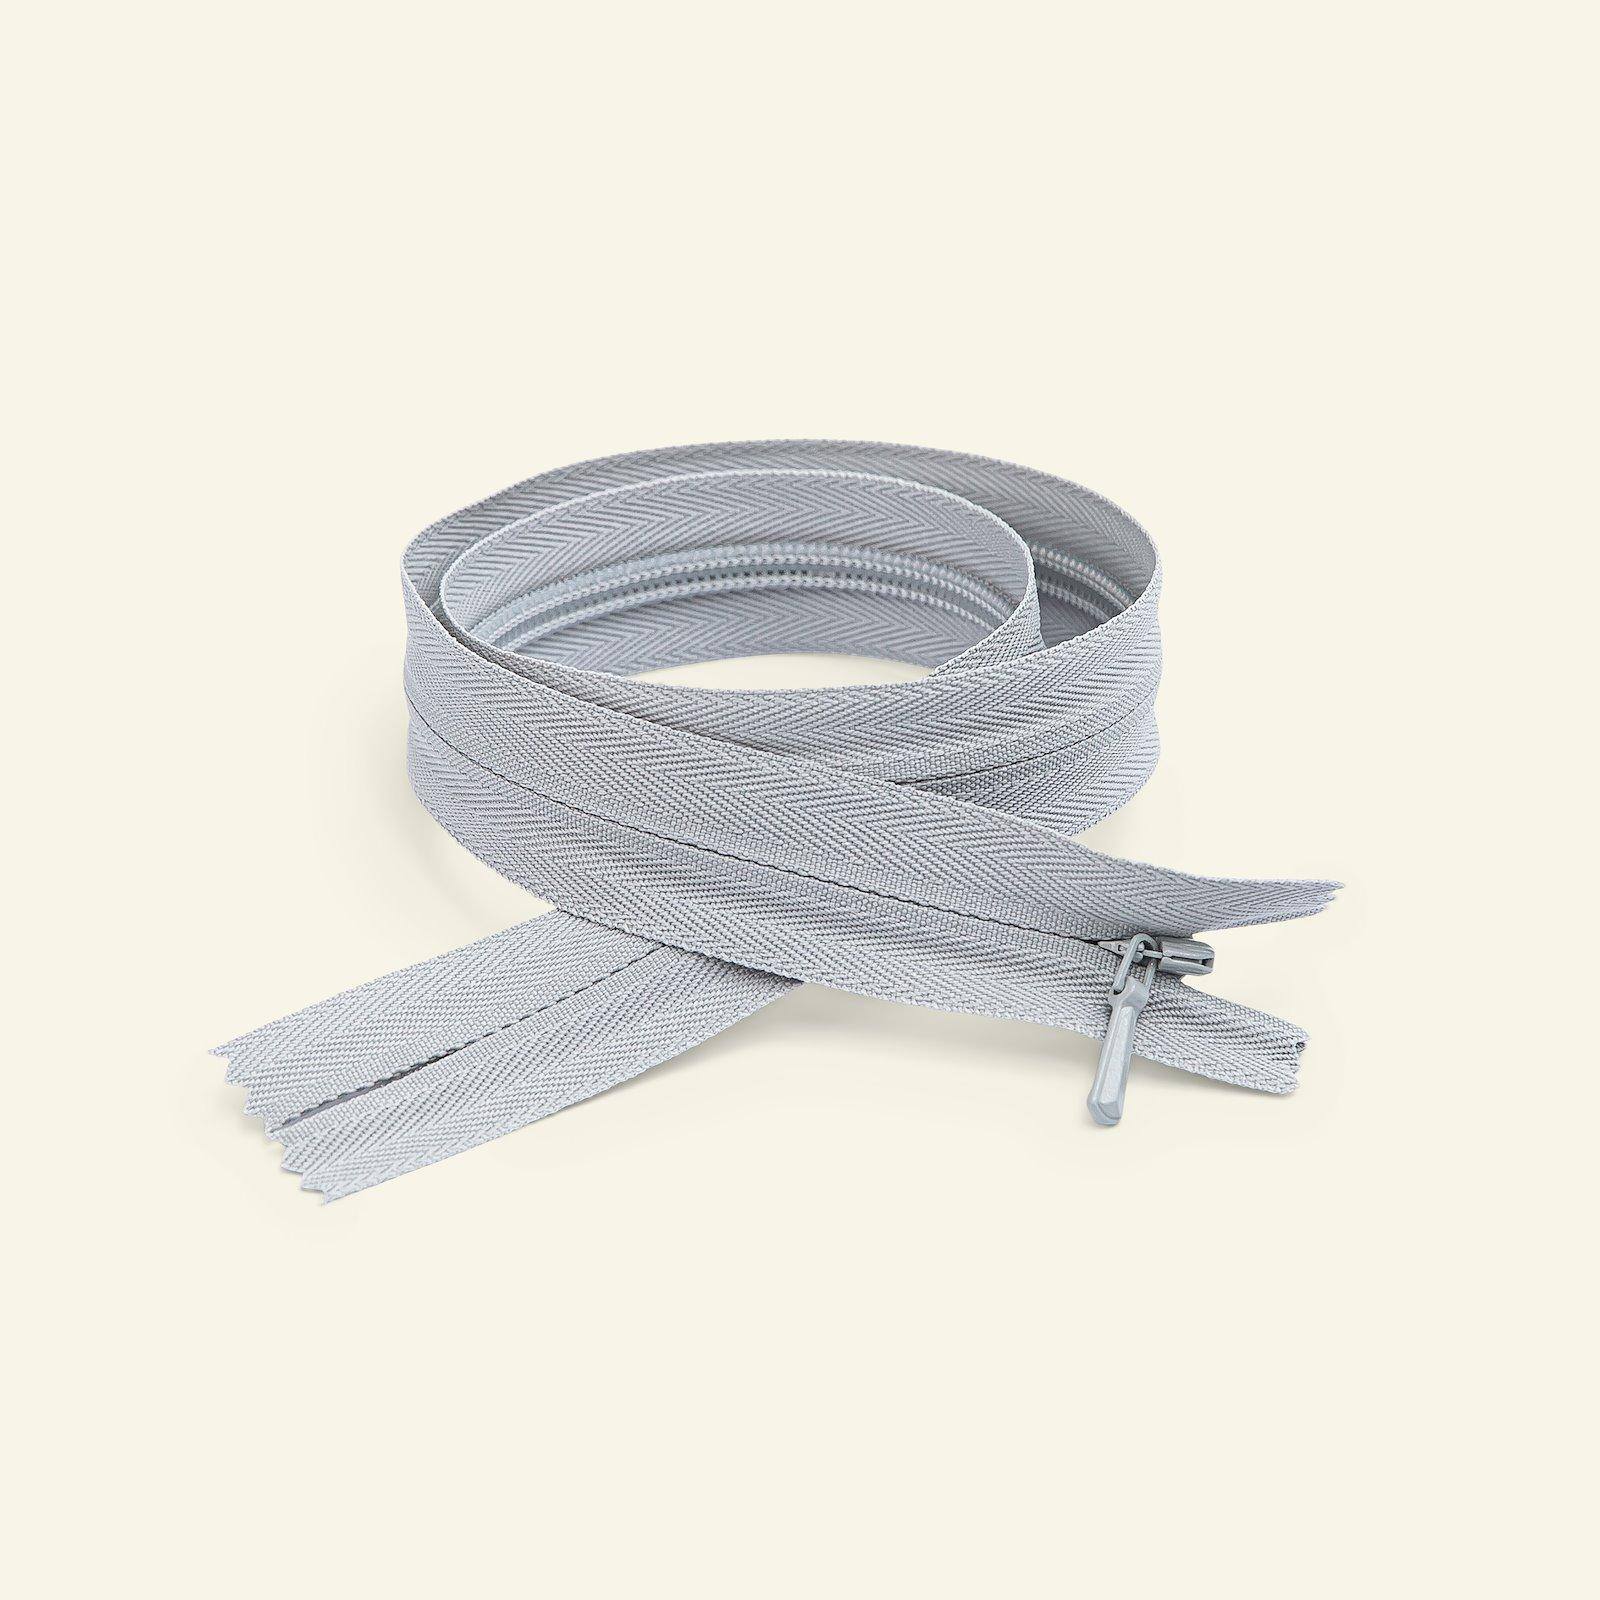 YKK zip 4mm invis closed 45cm soft gre x40739_pack